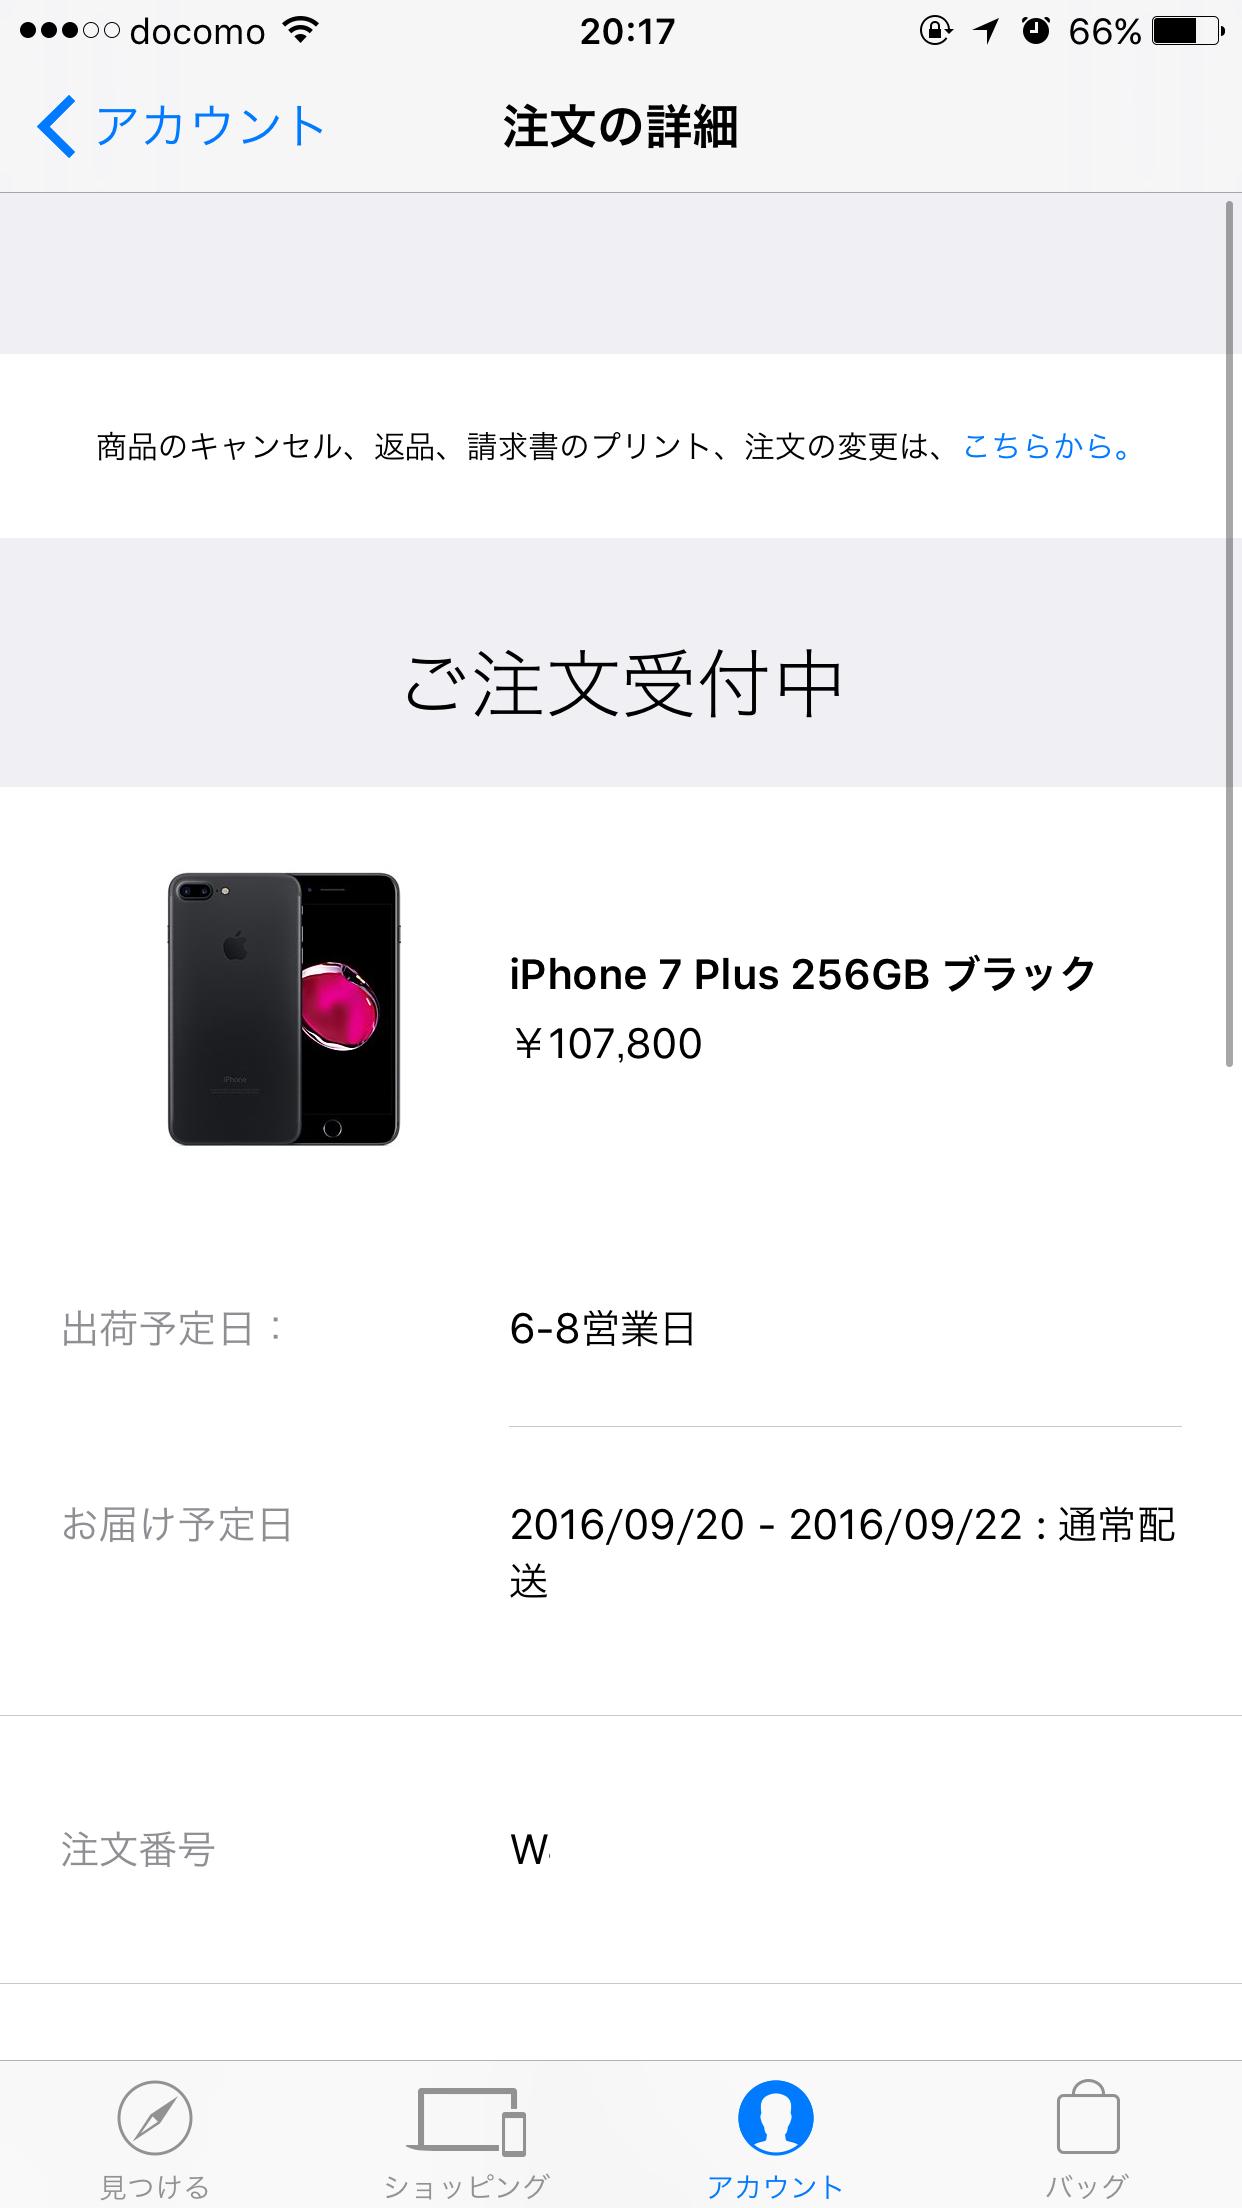 iPhone7&7Plus予約販売開始!SIMフリー版をポチッと^^